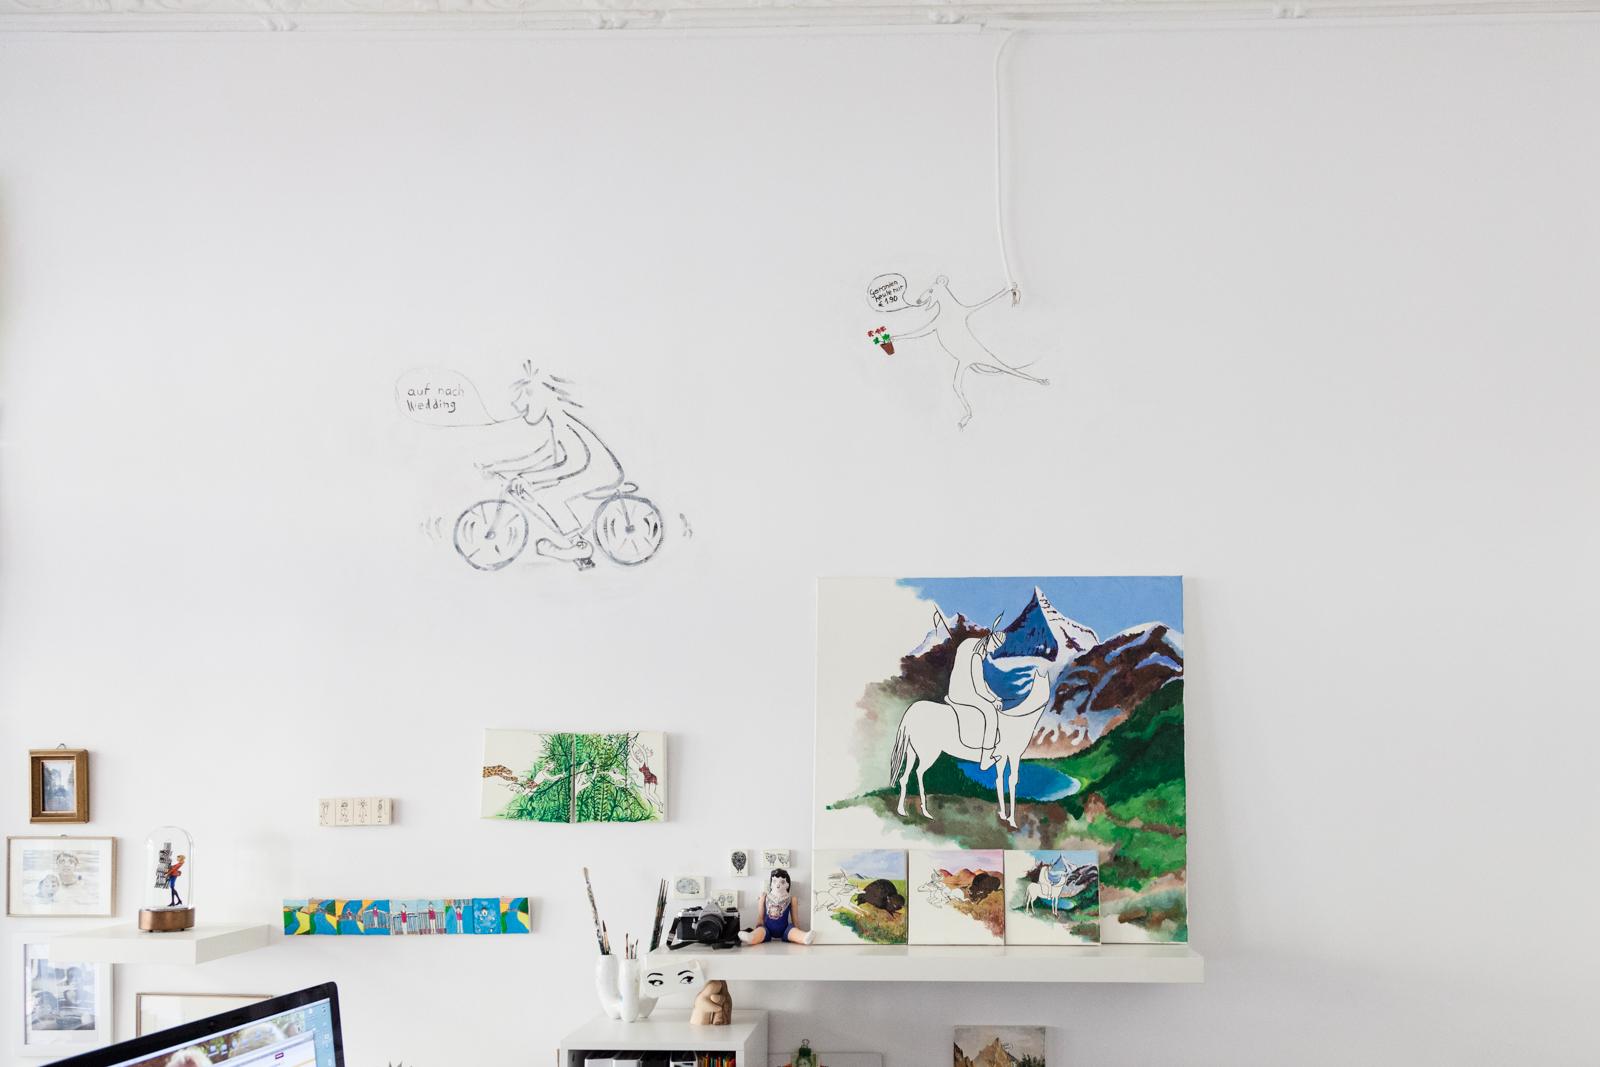 Illustration and Paintings by Gunilla Weinraub